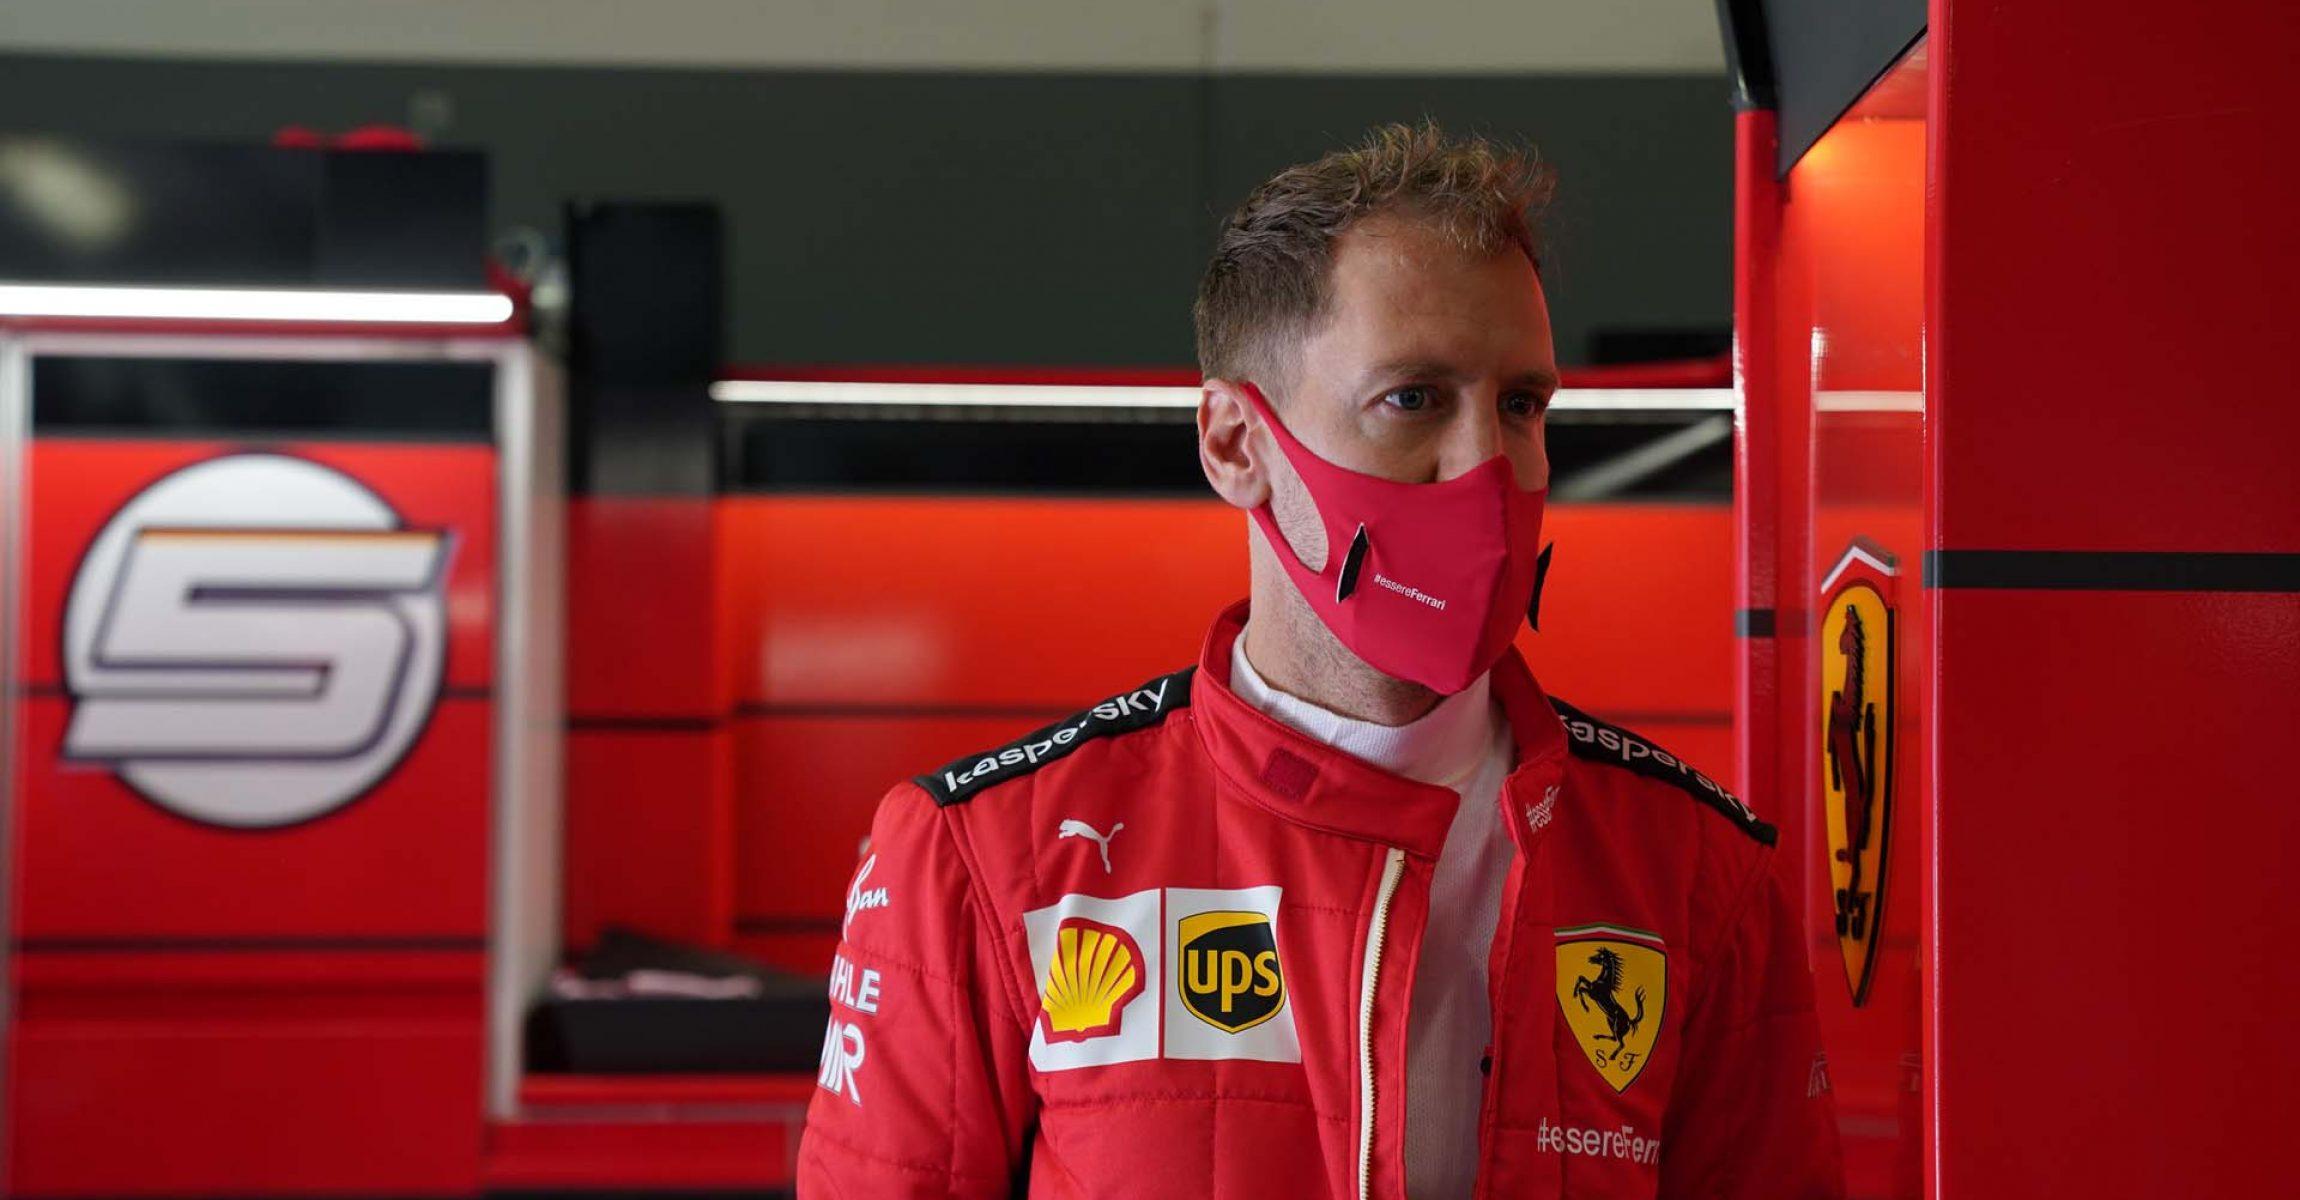 GP GERMANIA F1/2020 -  SABATO  10/10/2020   credit: @Scuderia Ferrari Press Office Sebastian Vettel Ferrari